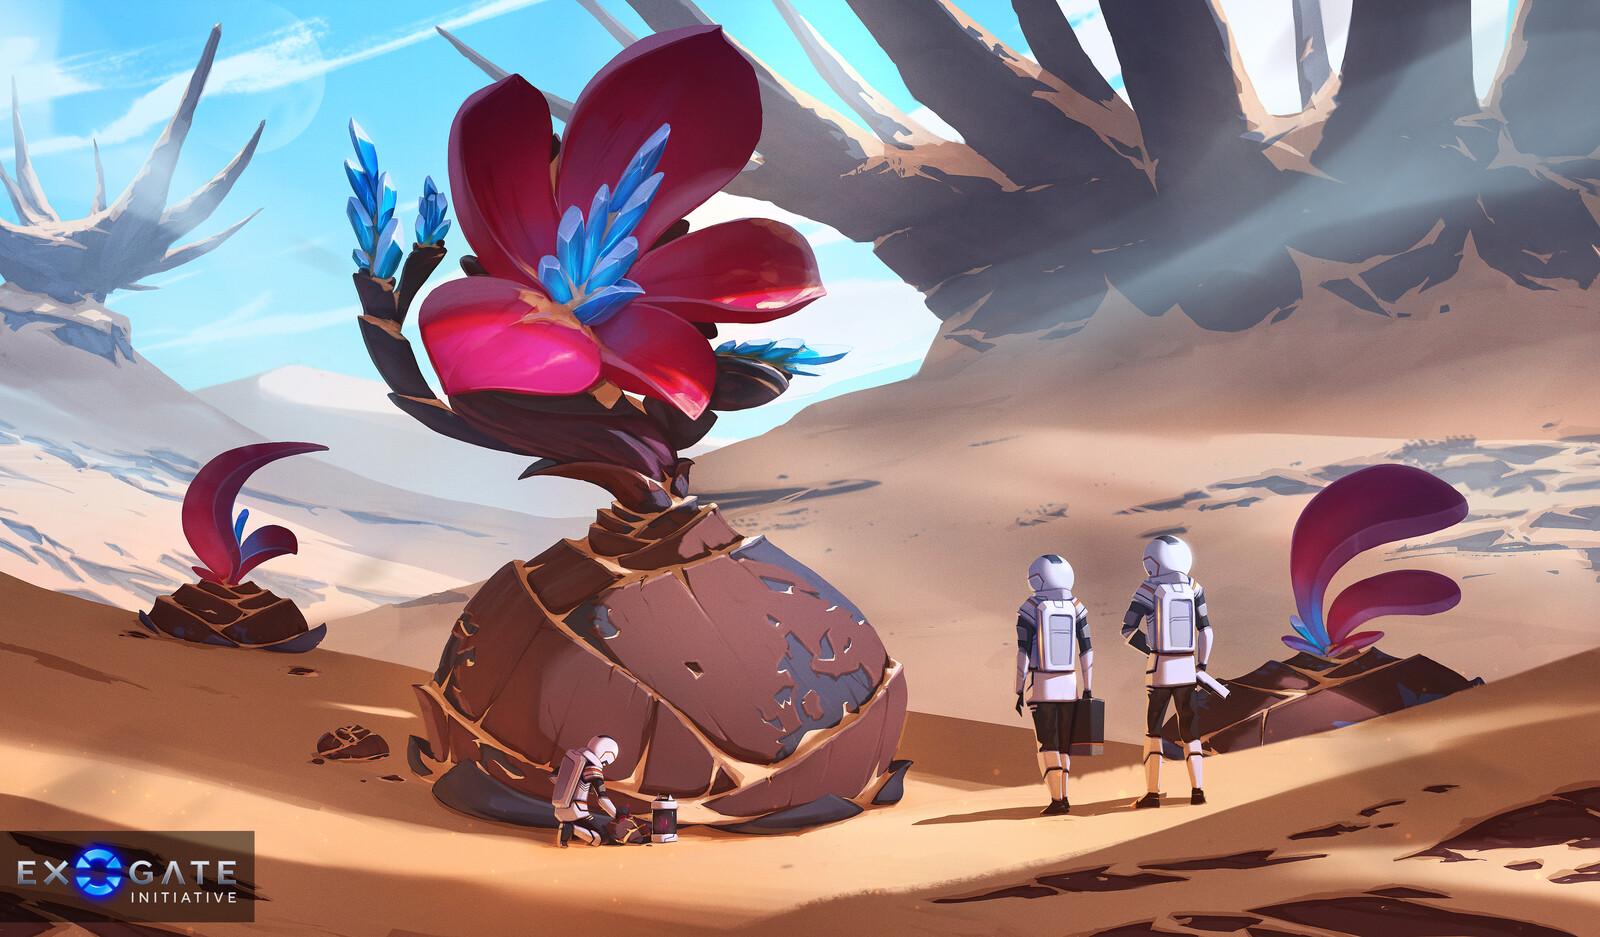 Exogate Initiative - Flora Encounter